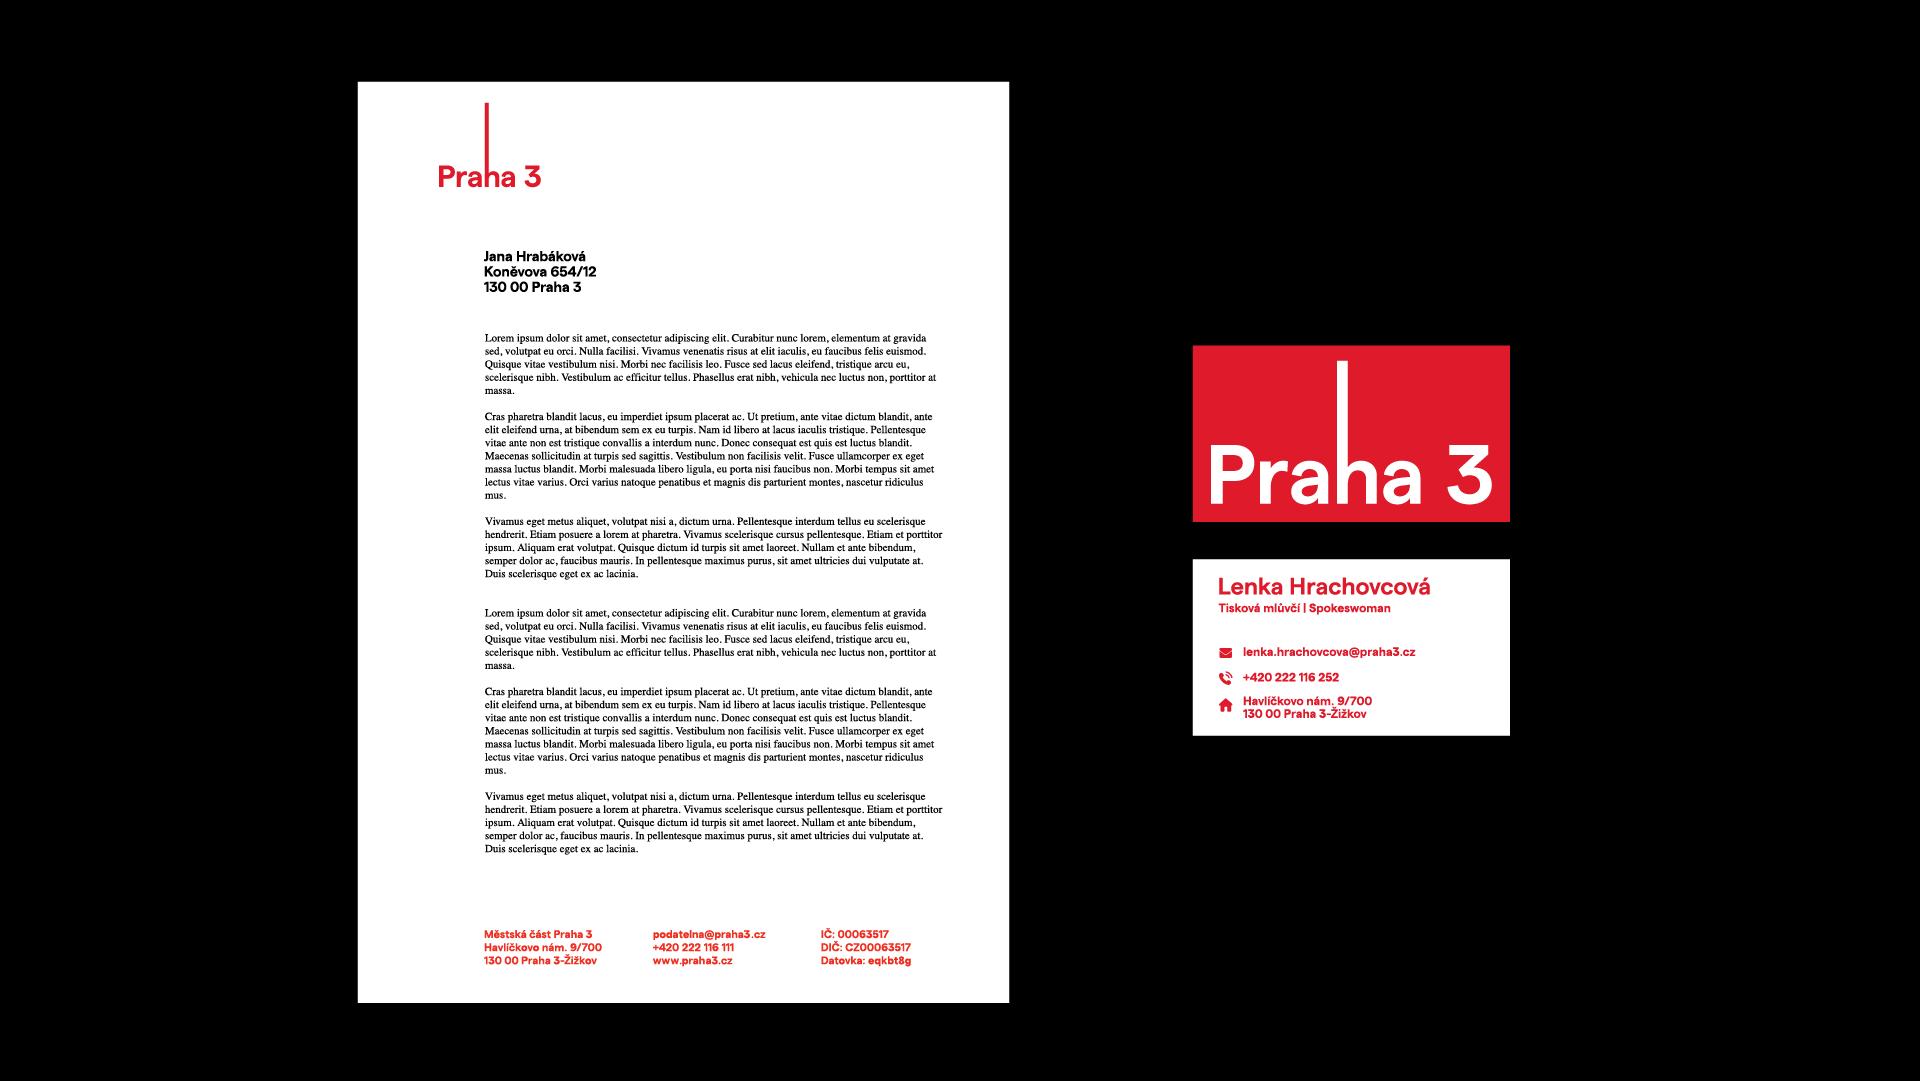 BROS IN TRIKOS Praha 3